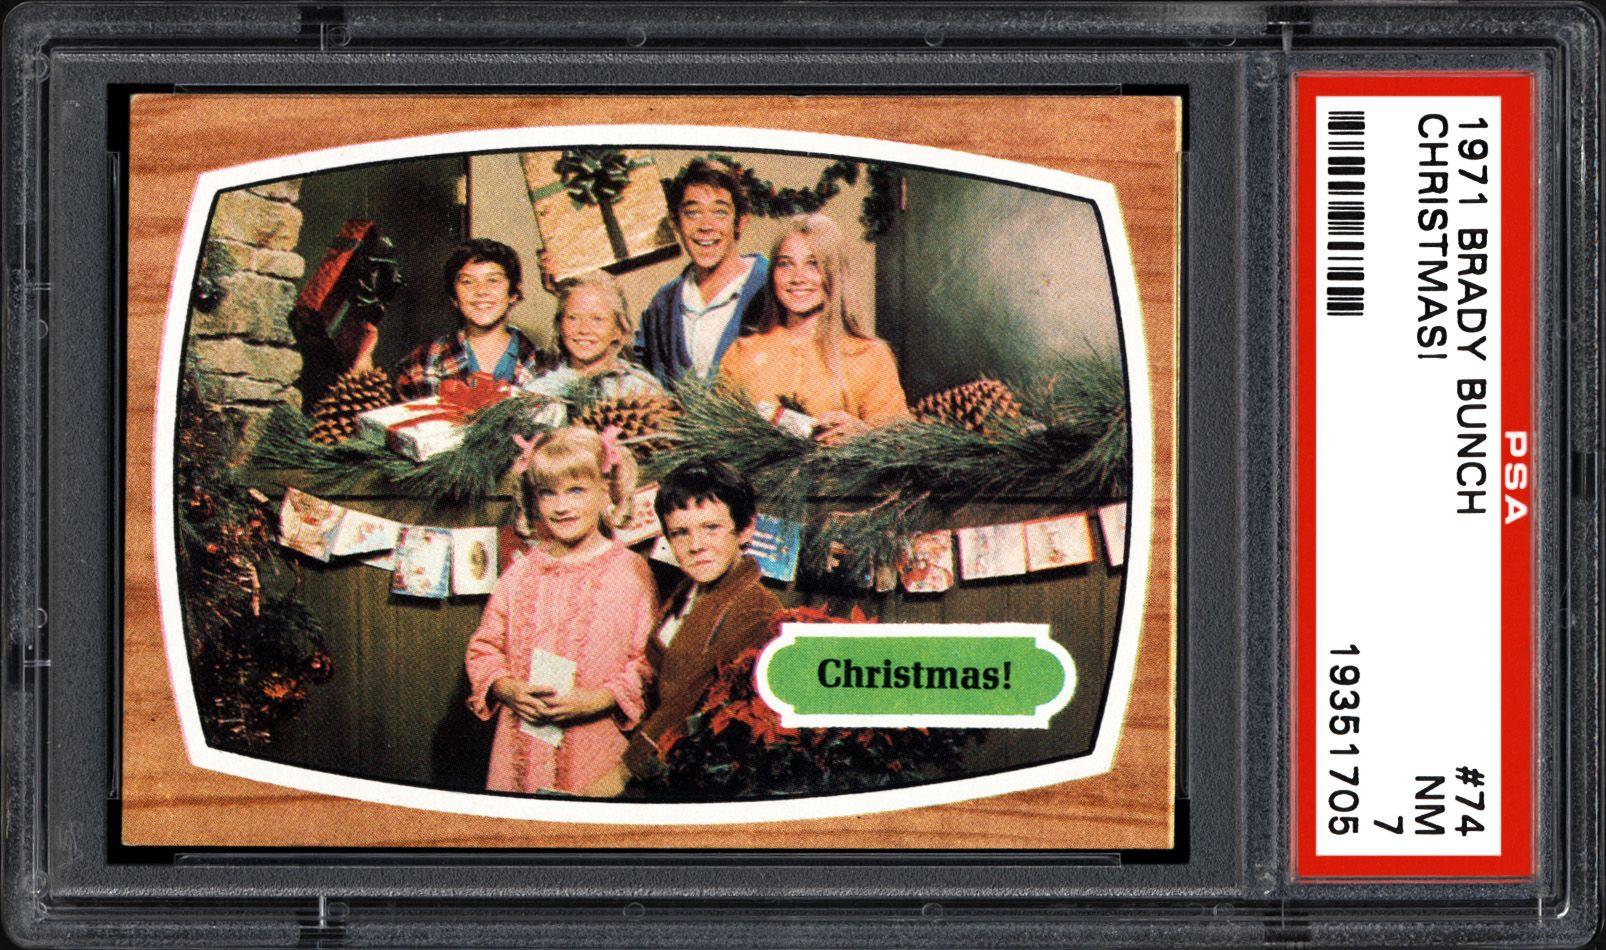 Brady Bunch Christmas Card.1971 Brady Bunch Christmas Psa Cardfacts